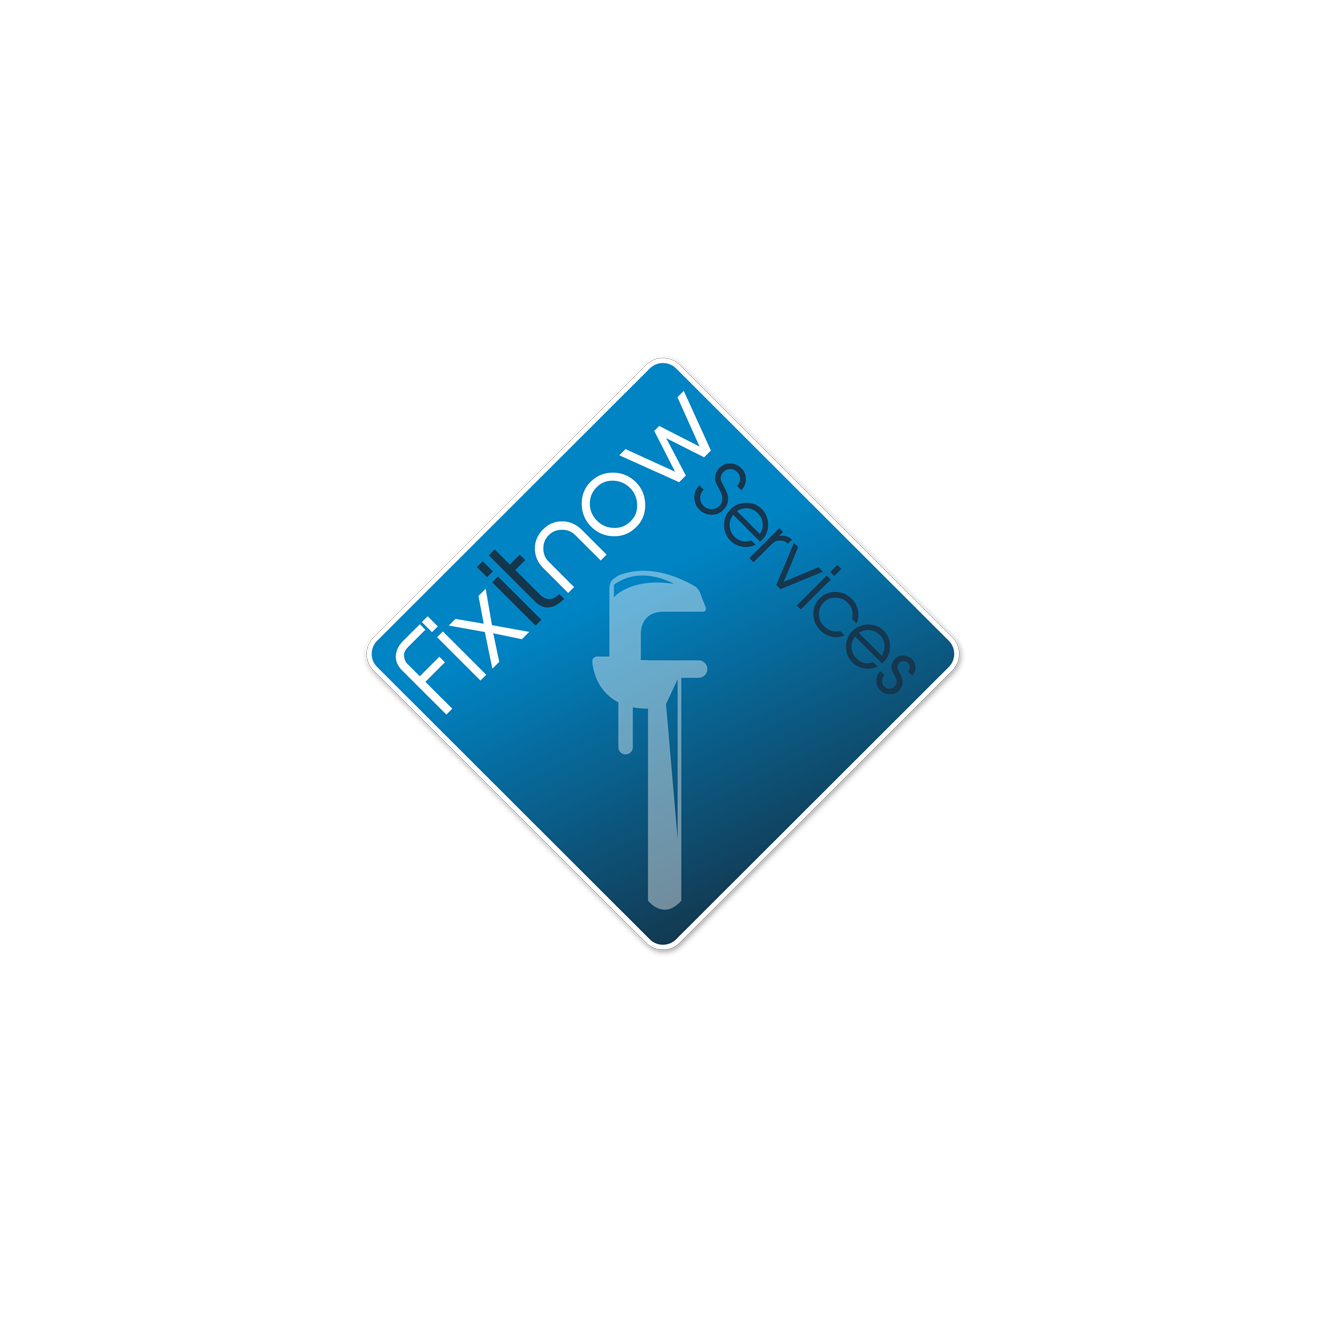 Fixitnow Services LLC